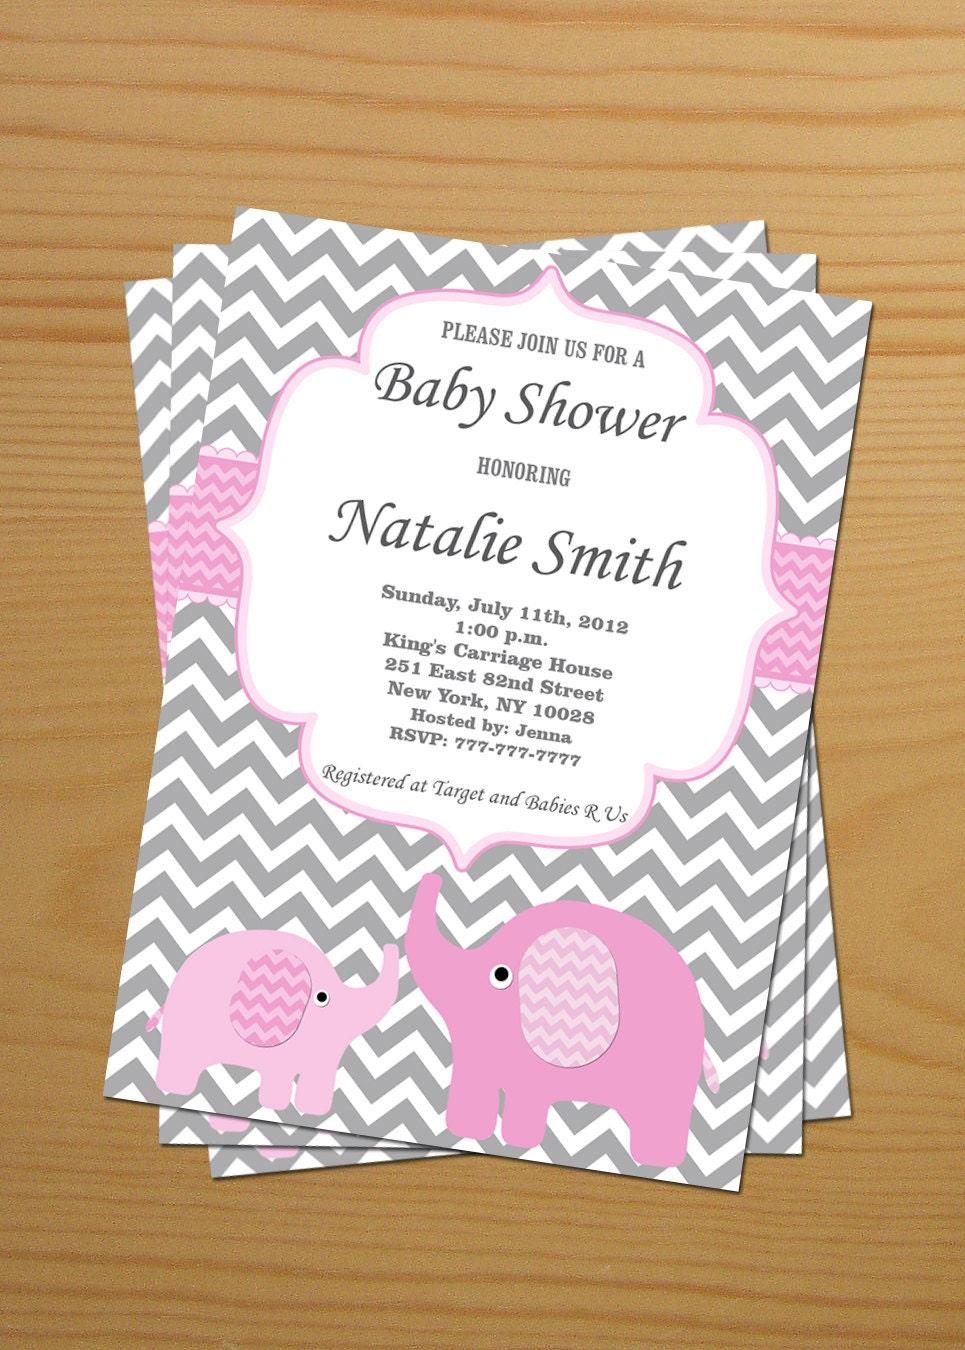 Baby shower invitation girl elephant baby shower invitation zoom filmwisefo Images